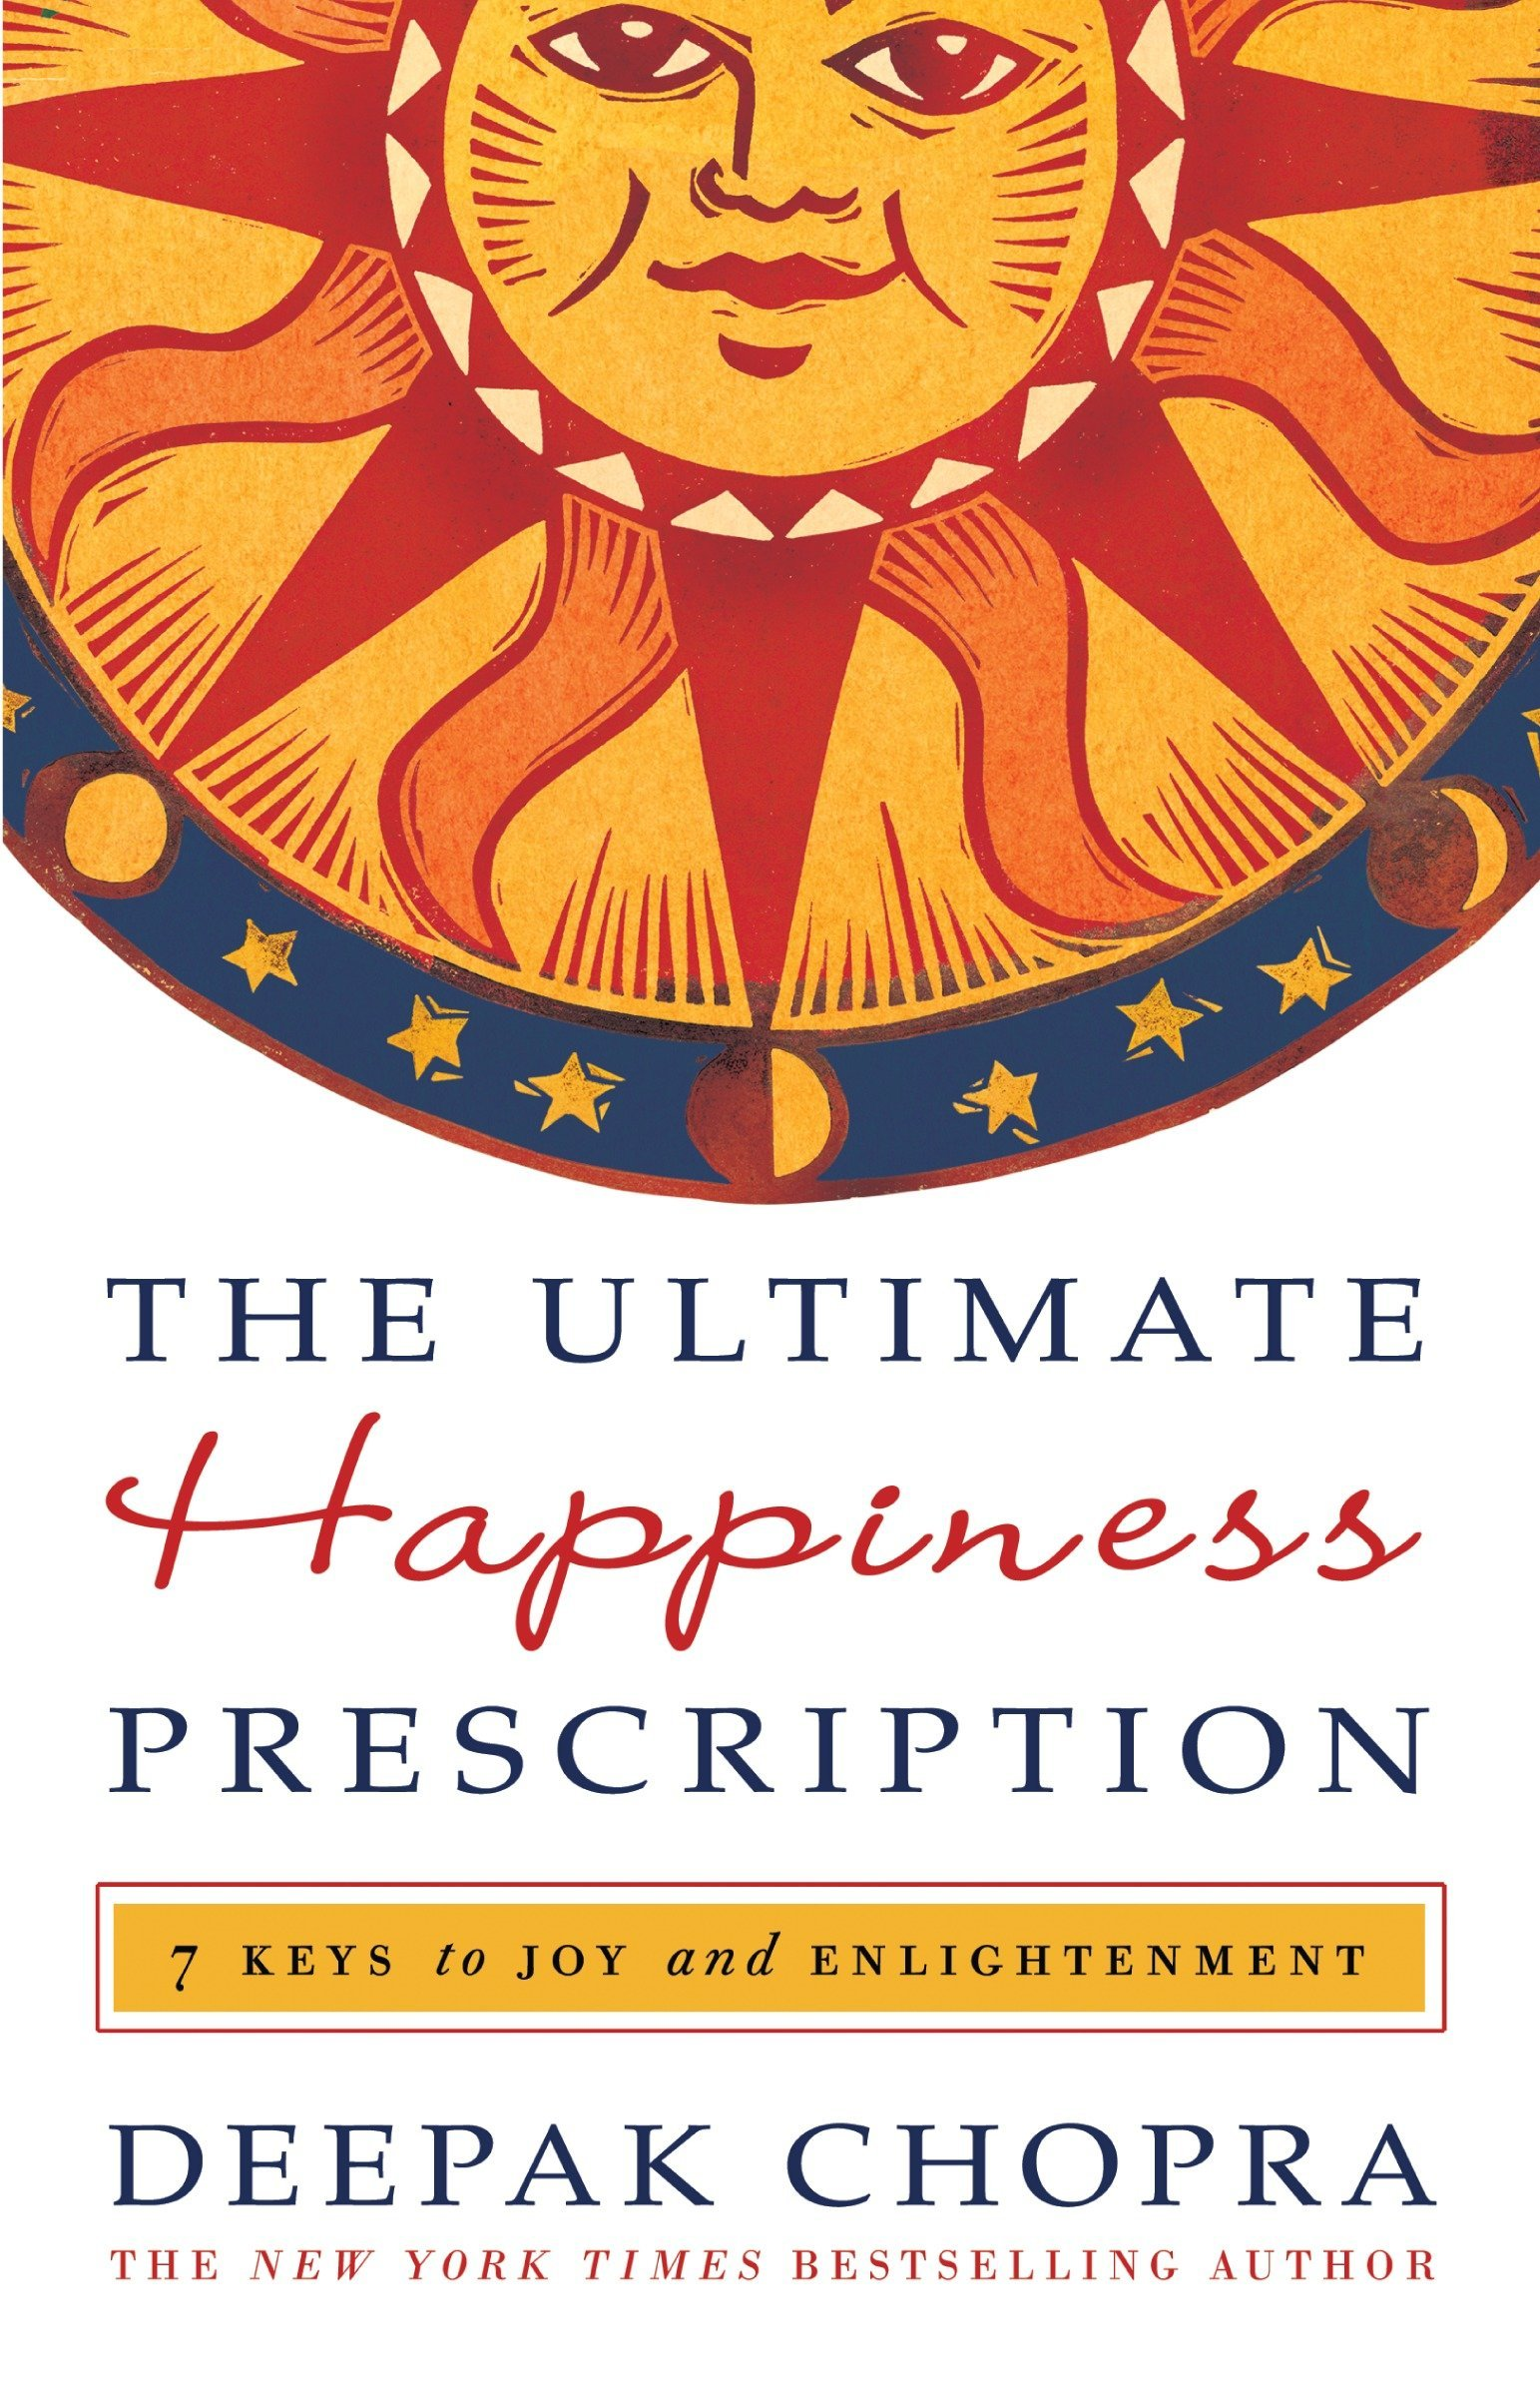 The Ultimate Happiness Prescription: 7 Keys to Joy and Enlightenment:  Deepak Chopra M.D.: 9780307589712: Amazon.com: Books